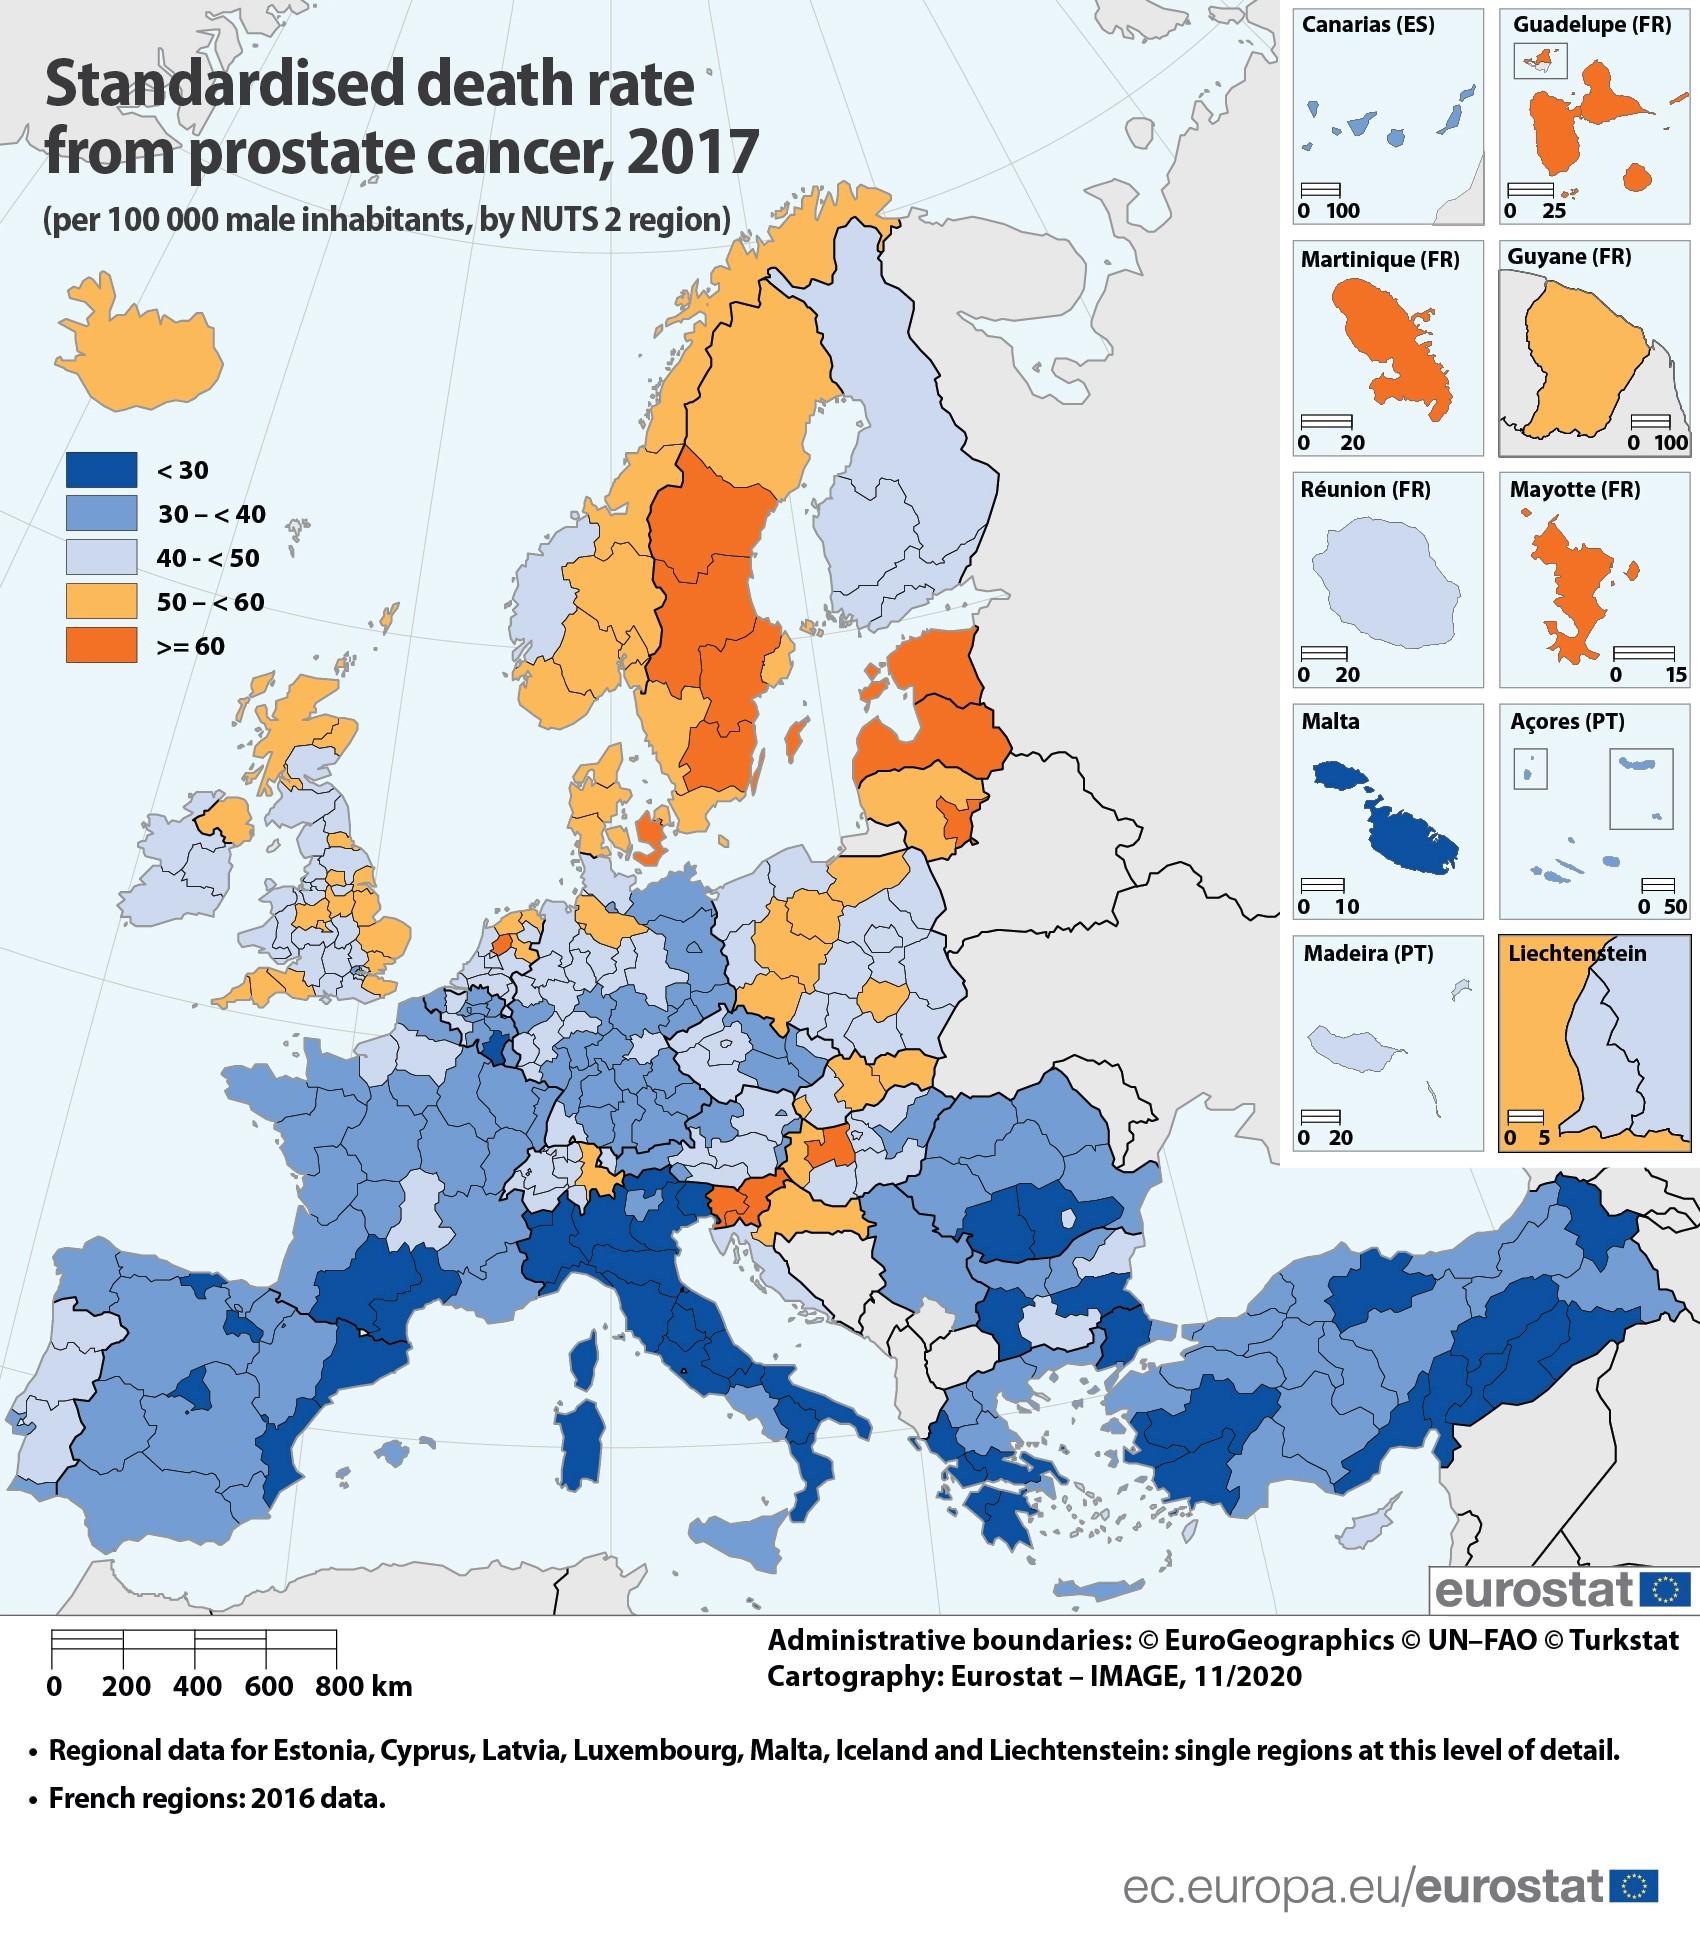 Deaths from prostate cancer in EU regions.jpg